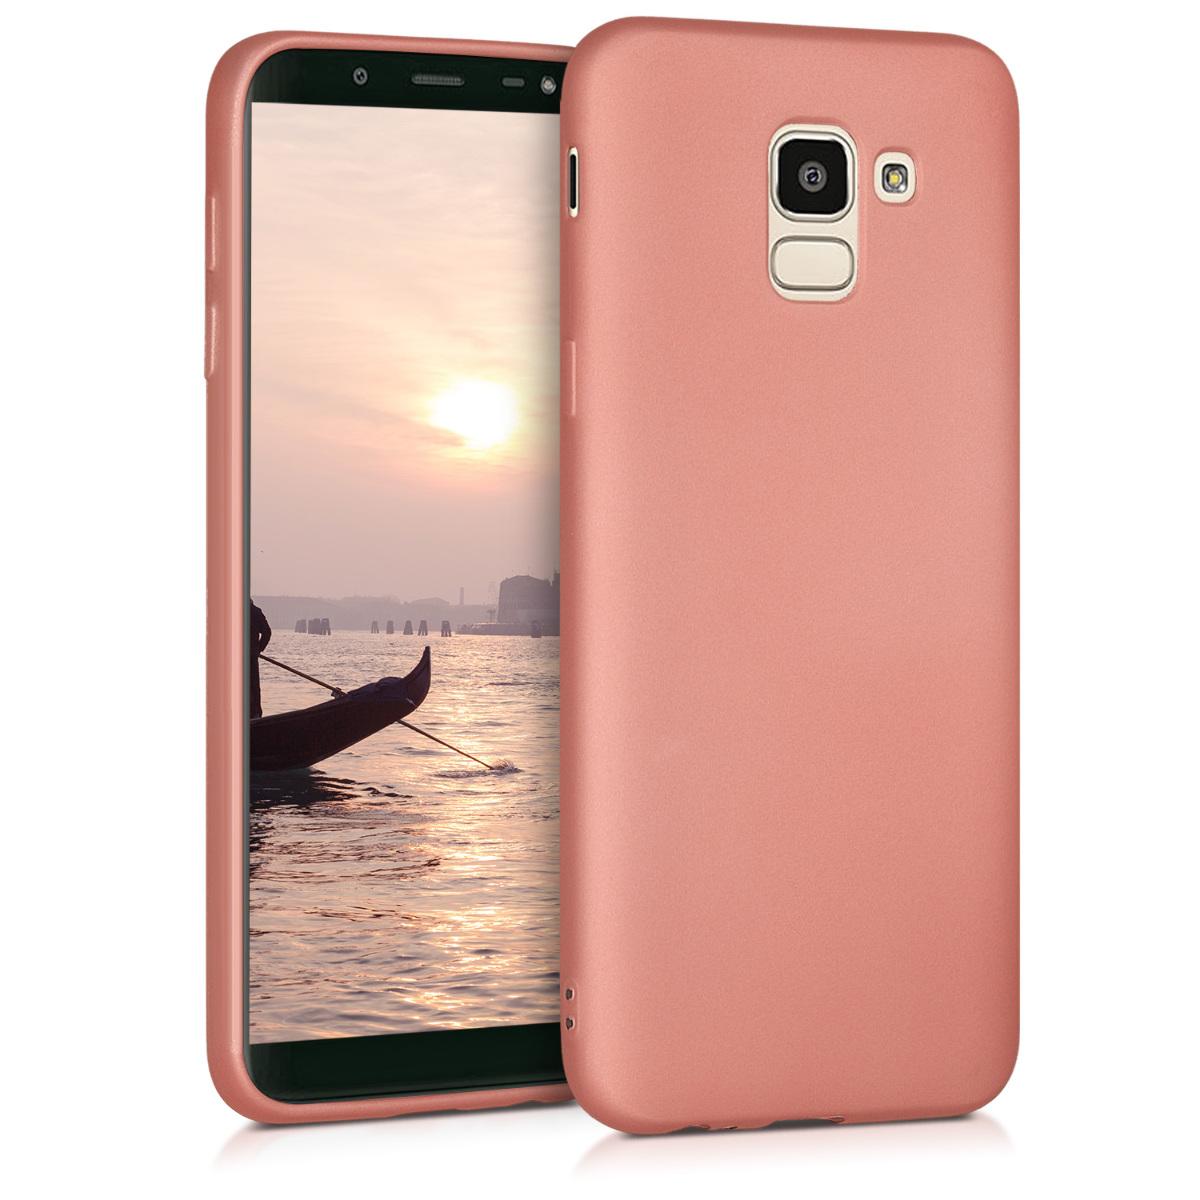 KW Θήκη Σιλικόνης Samsung Galaxy J6 - Soft Flexible Shock Absorbent- Metallic Rose Gold (46848.31)